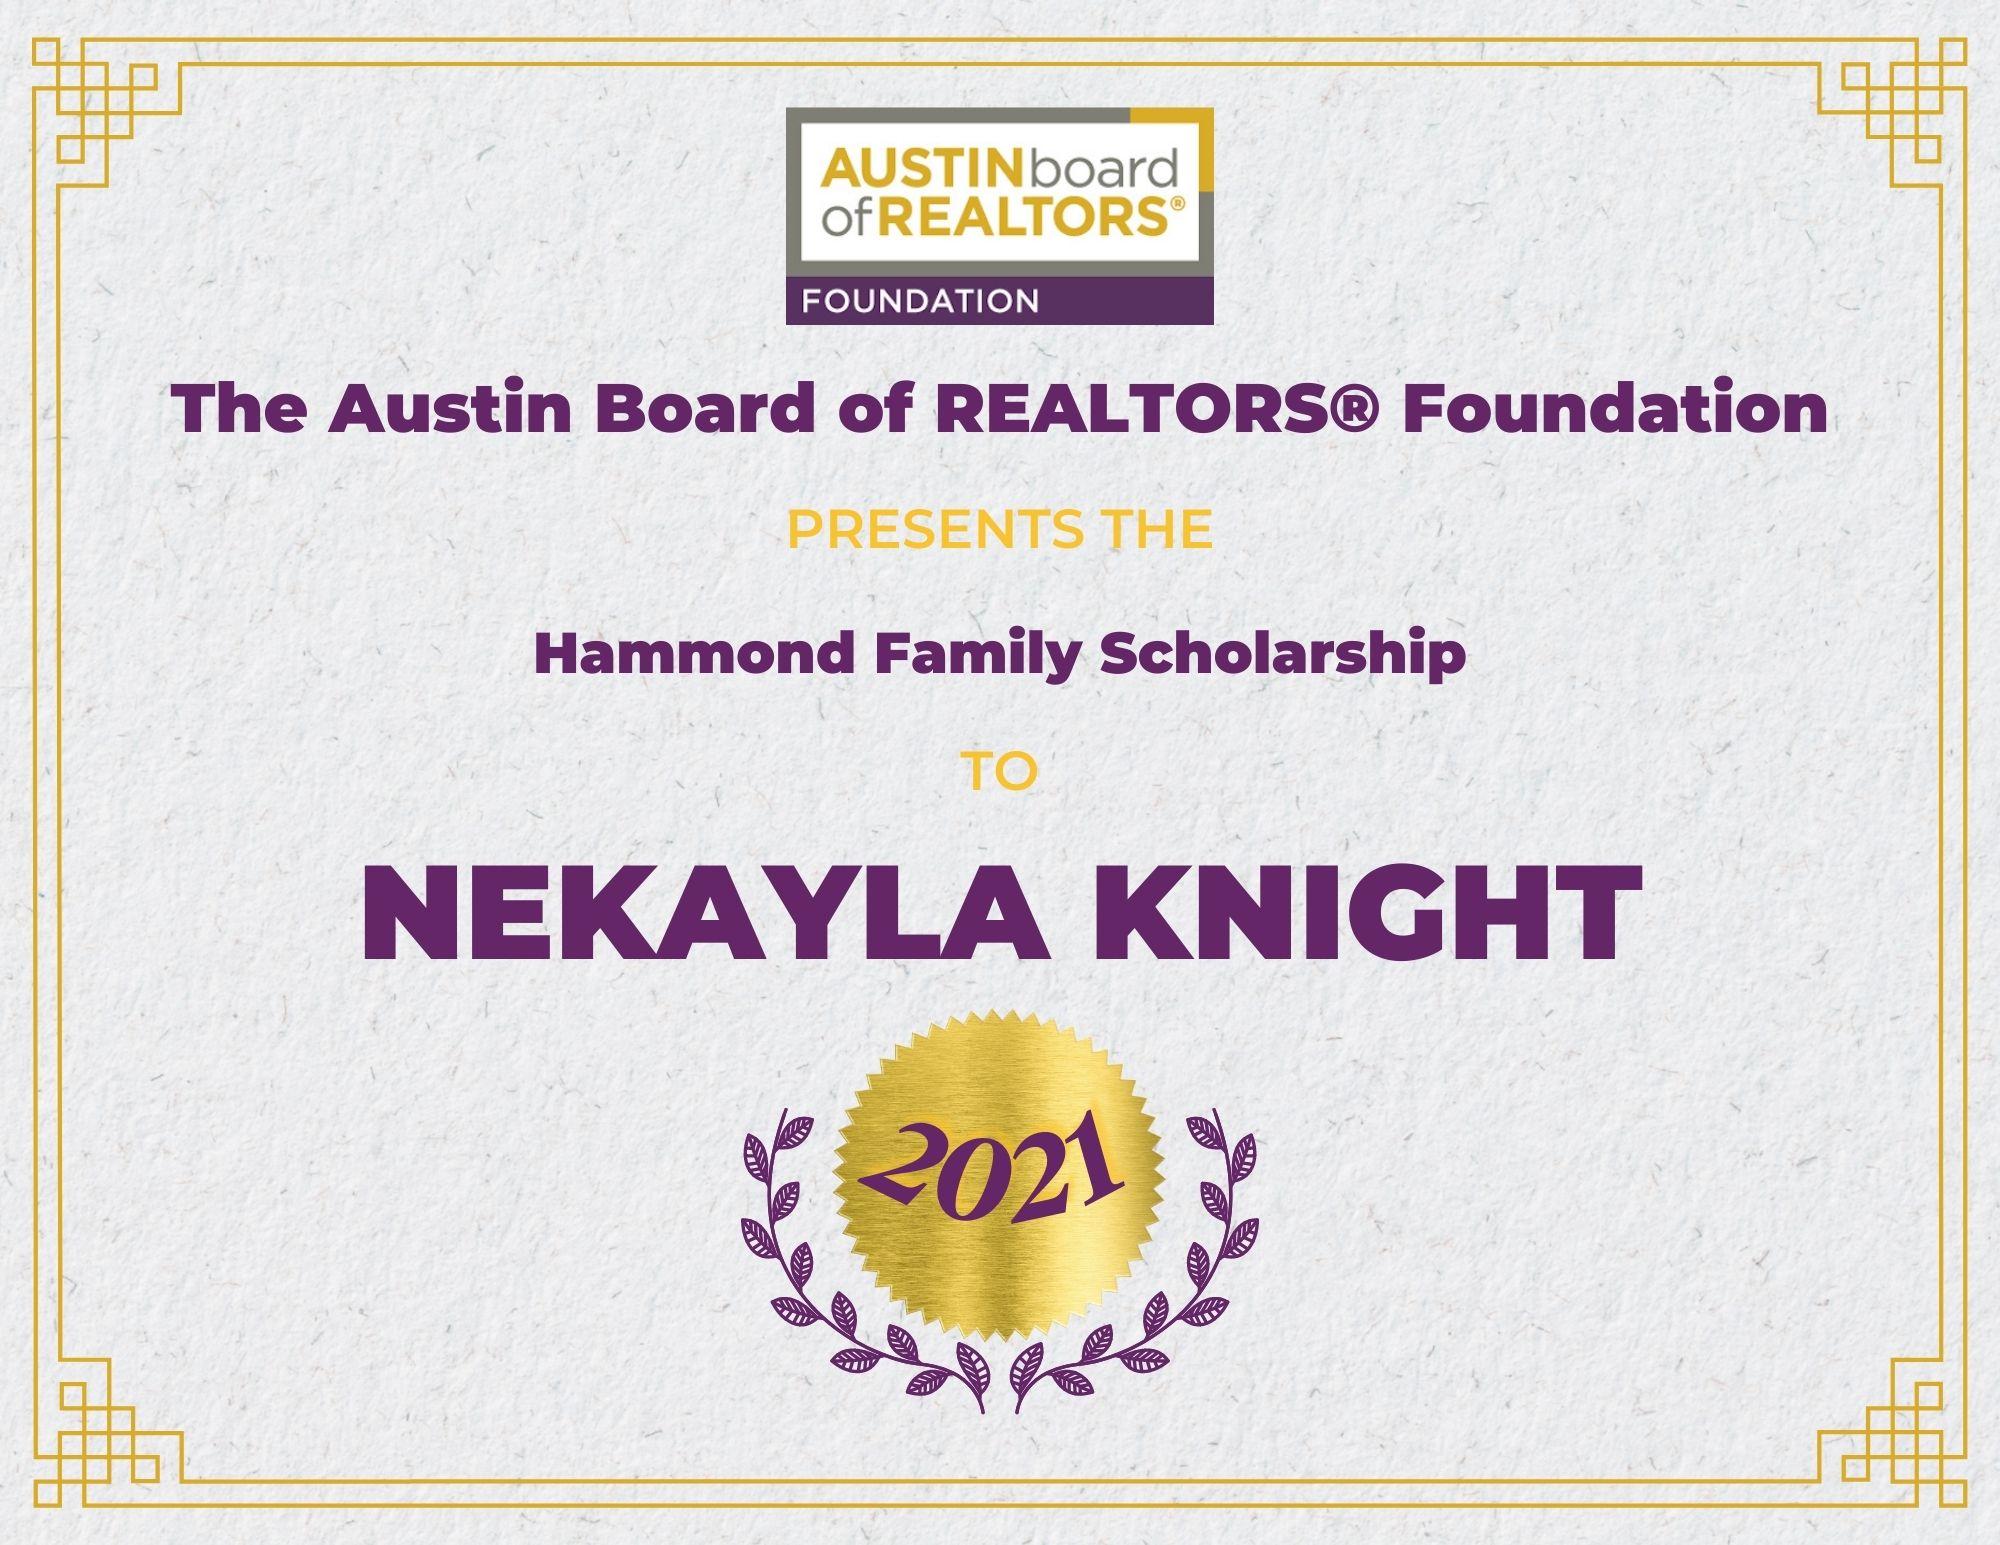 2021 Fou Scholarship Certificate Nekaylaknight